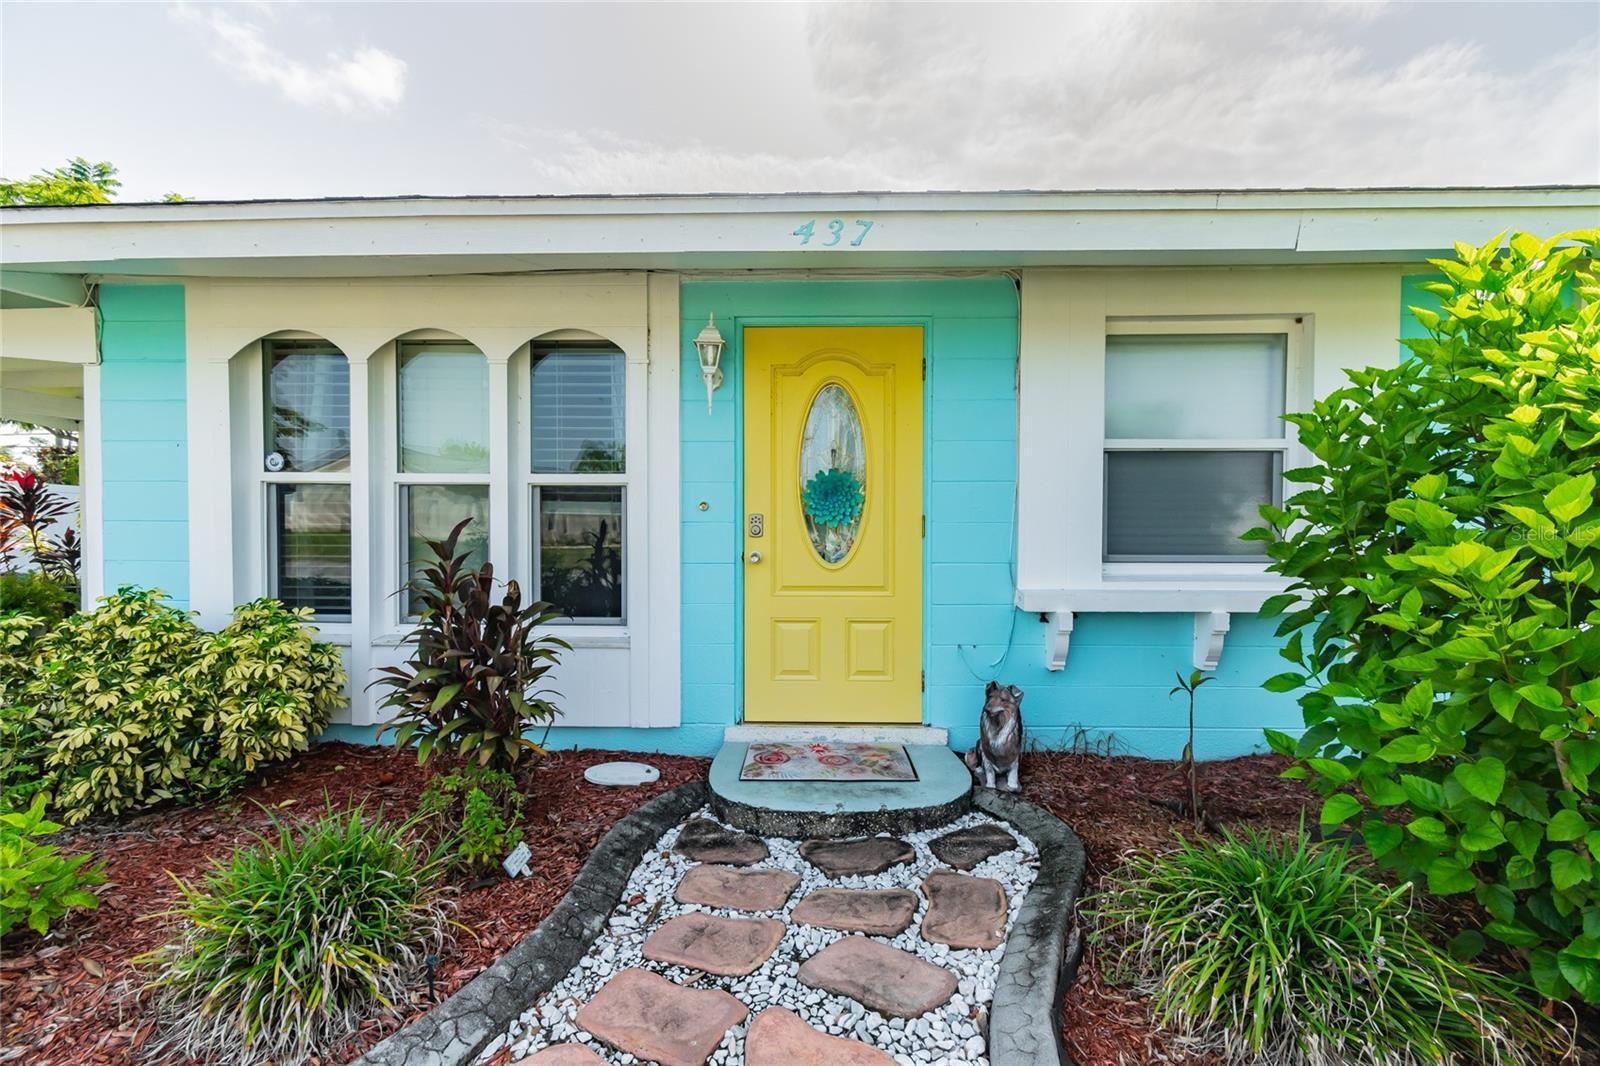 437 SKYLARK LANE NW, Port Charlotte, FL 33952 - #: U8134693